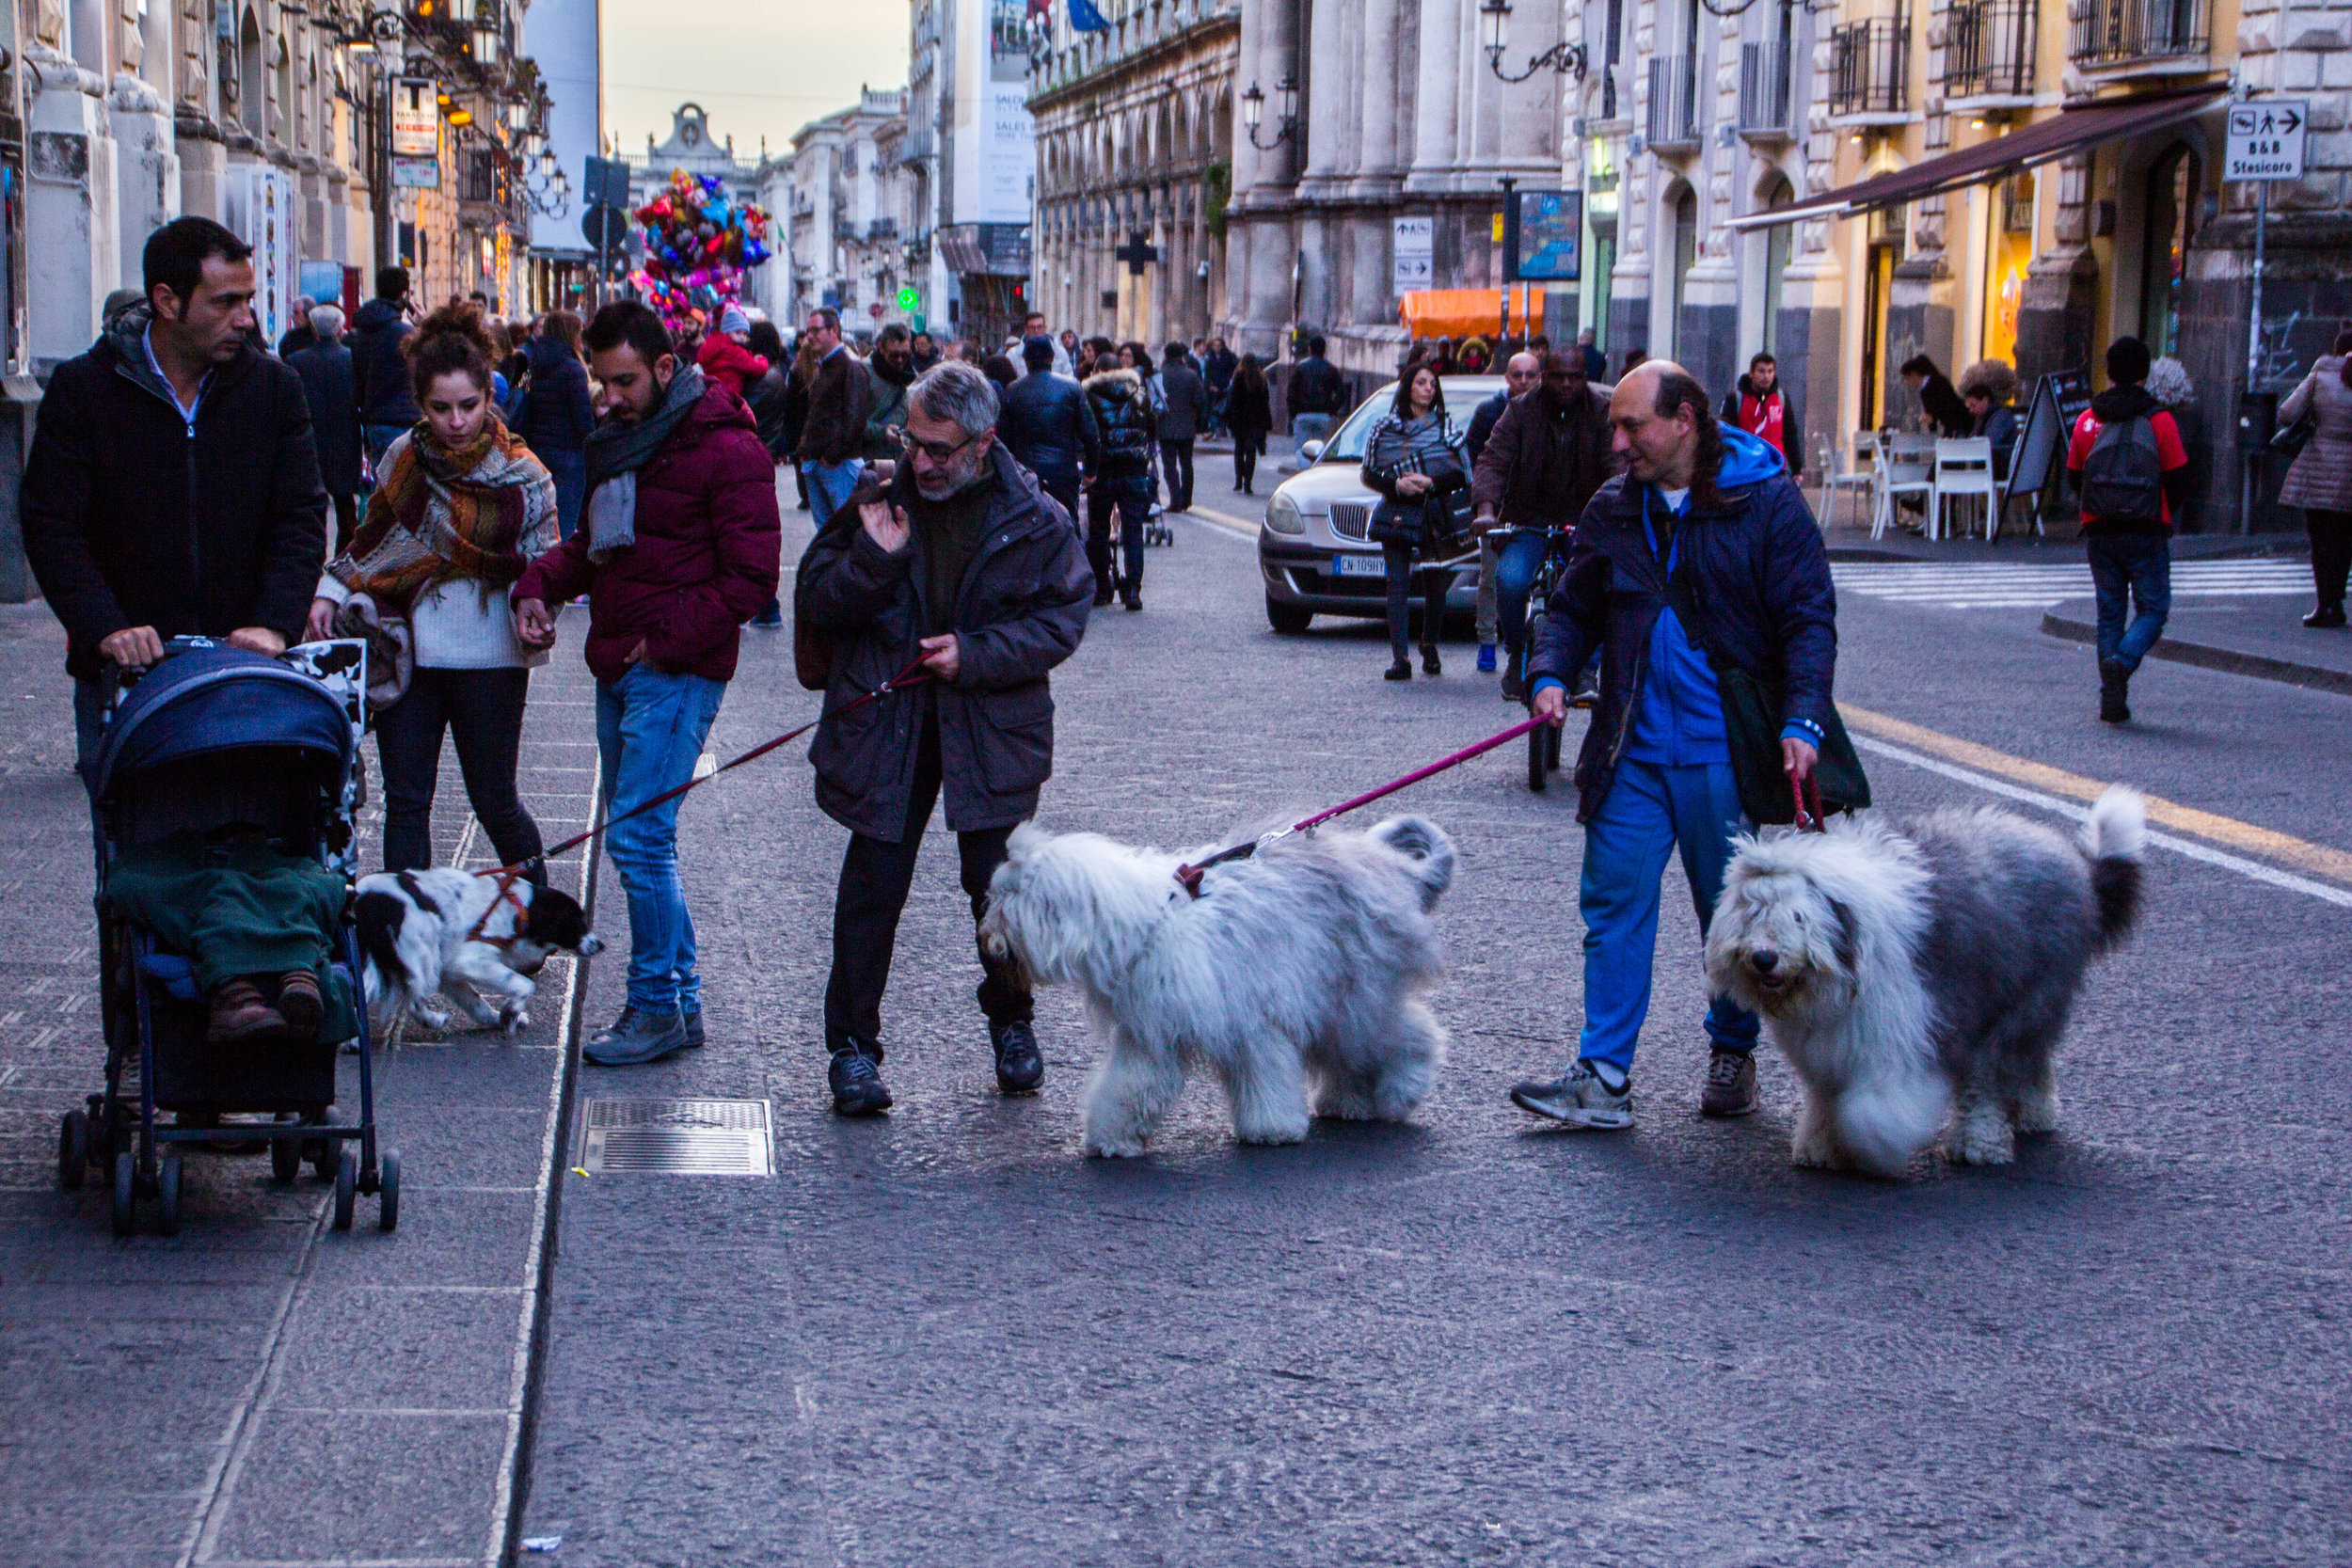 streets-catania-sicily-sicilia-13.jpg